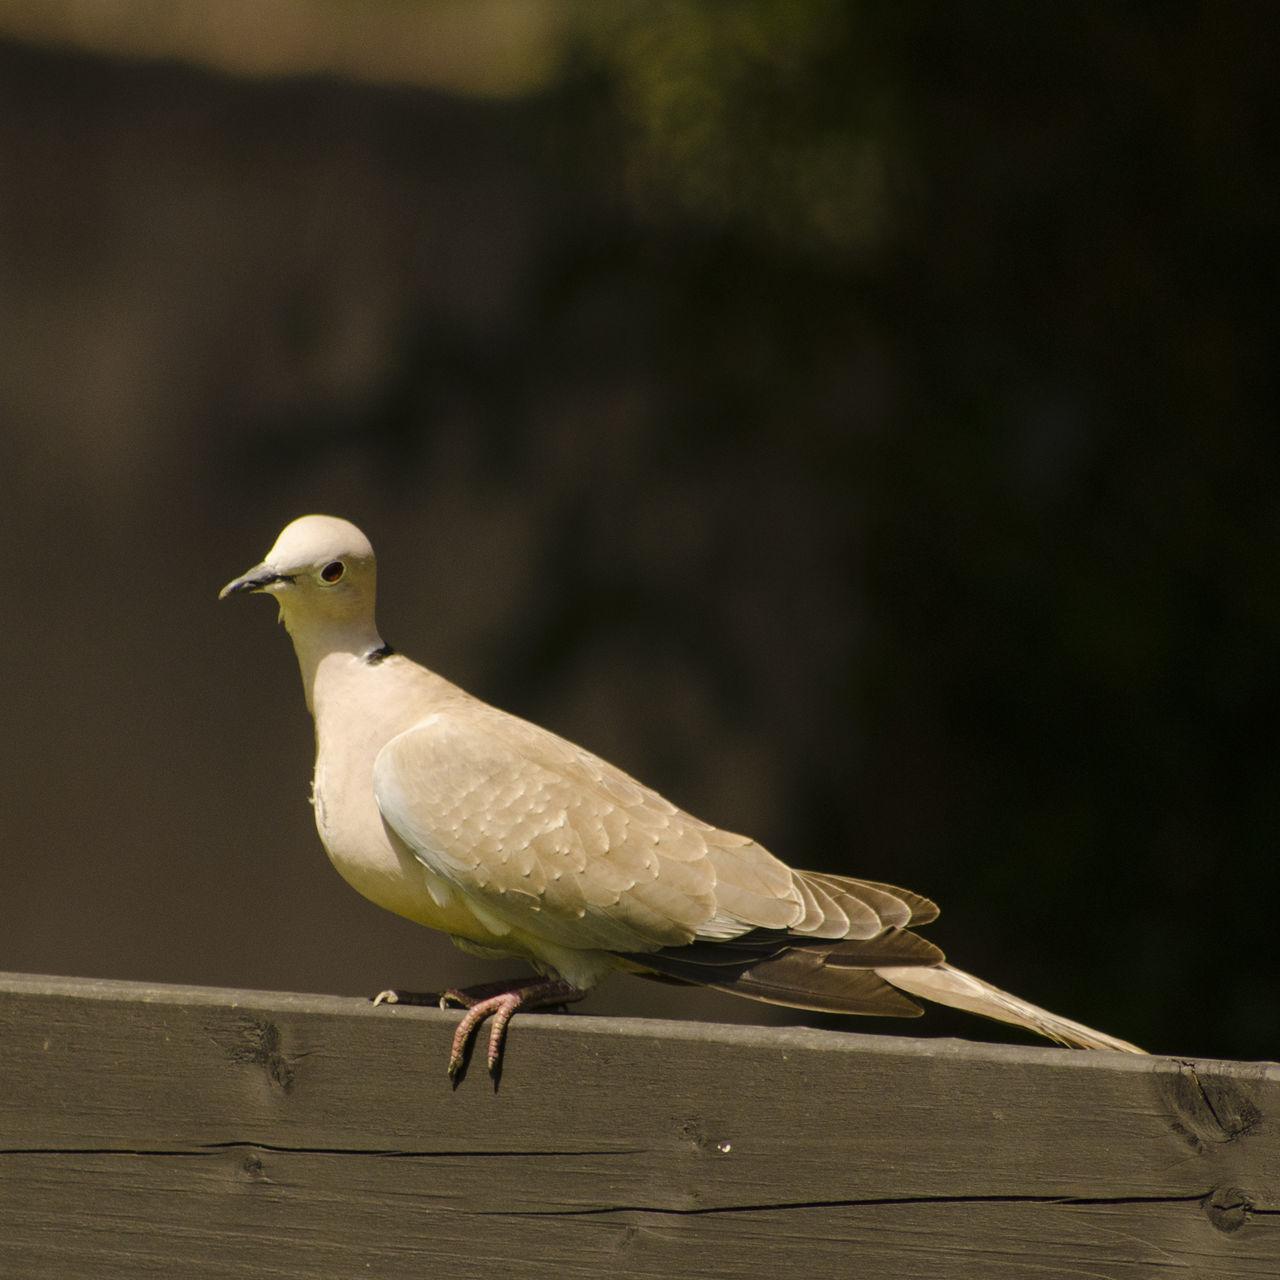 Beautiful stock photos of friedenstaube, bird, perching, animal themes, one animal